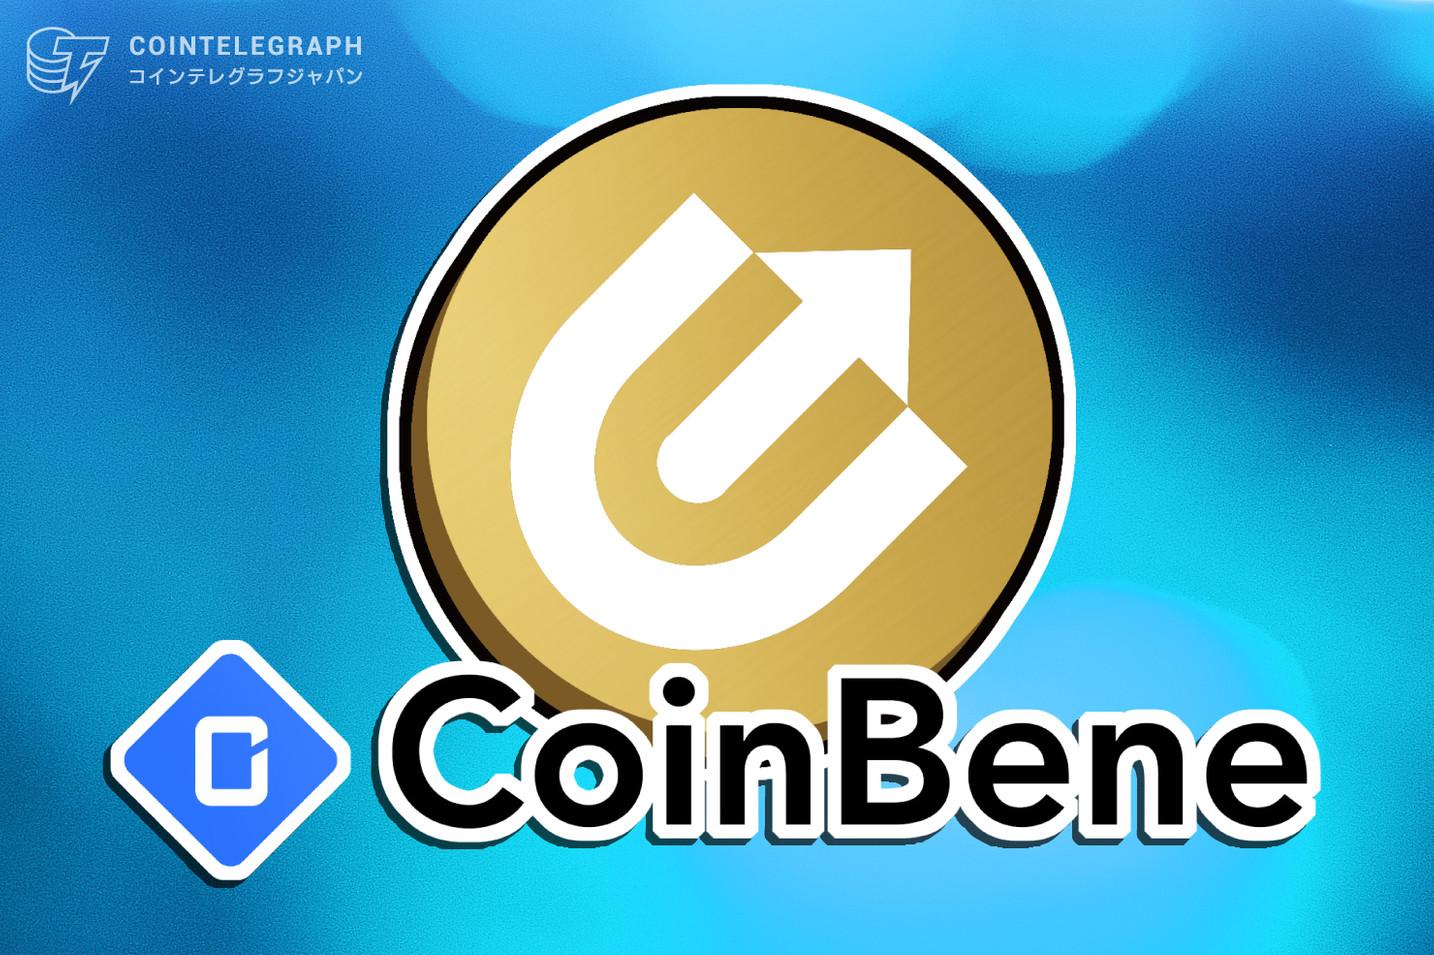 CoinBene、先物取引による取引マイニングを開始 取引手数料として新規発行通貨CFTを配布